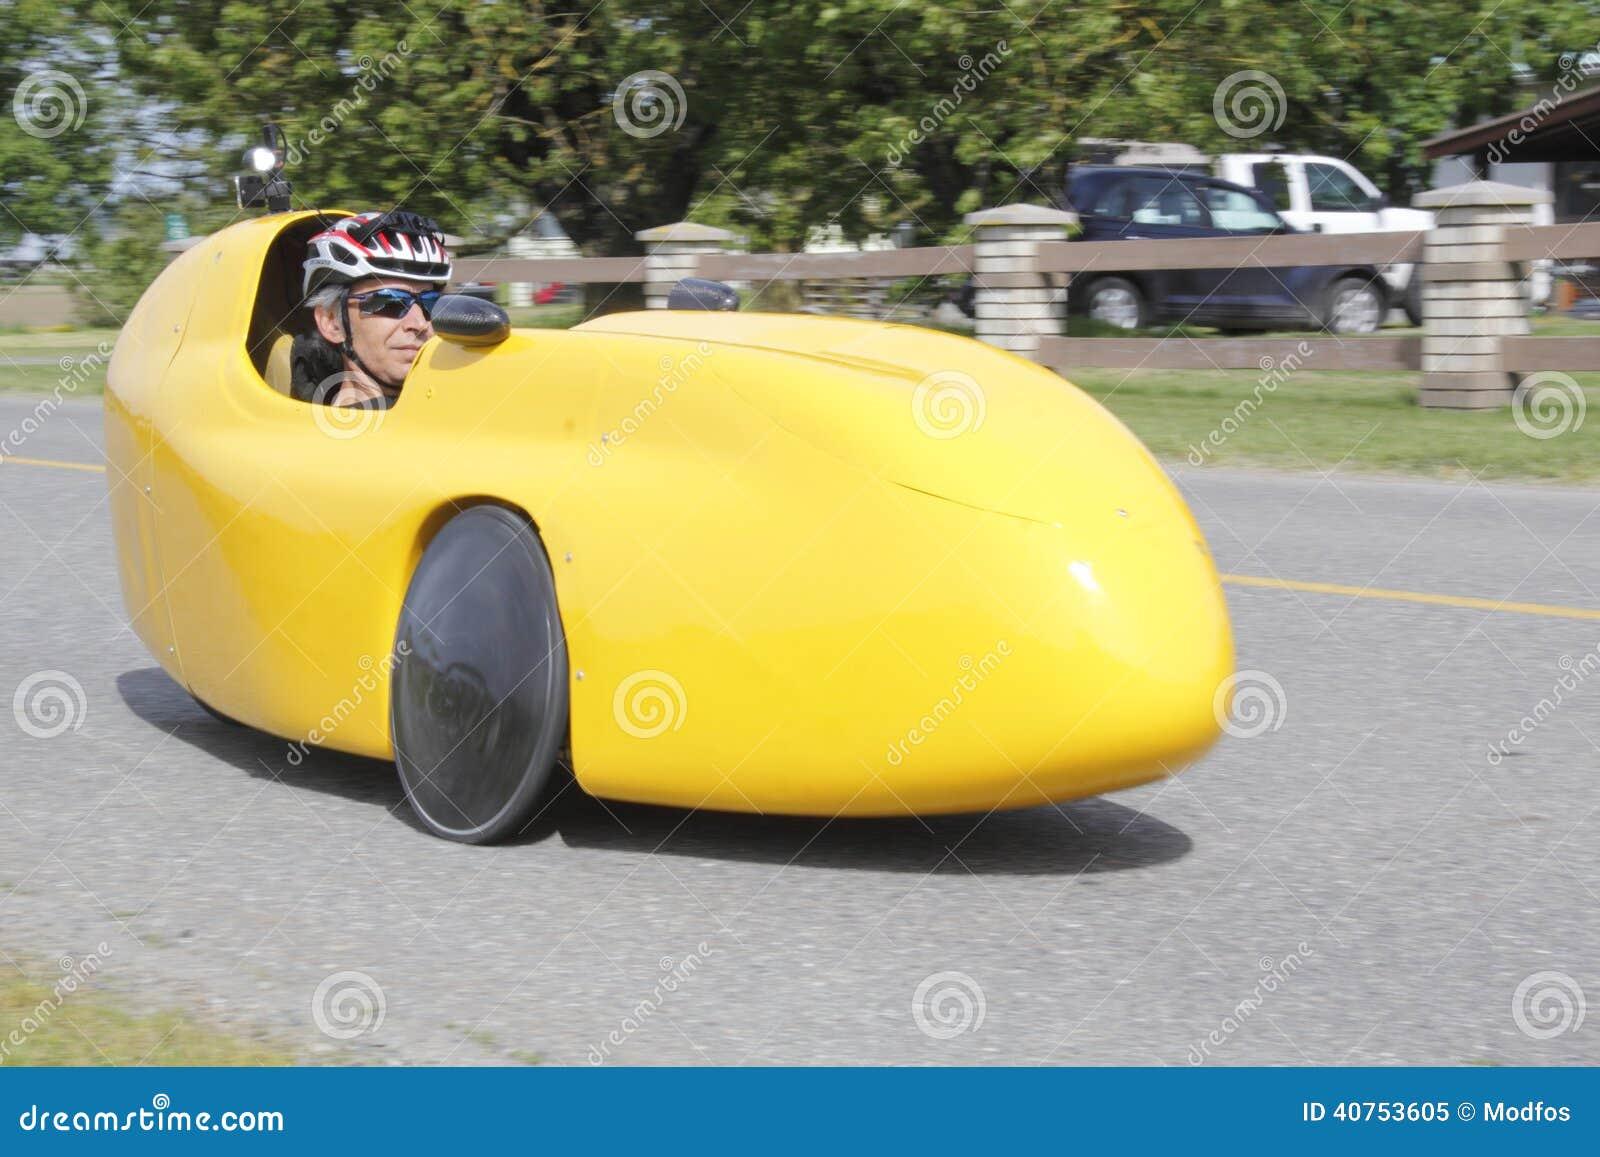 Velomobile Fahrrad Auto Oder Liegendes Fahrrad Stockbild